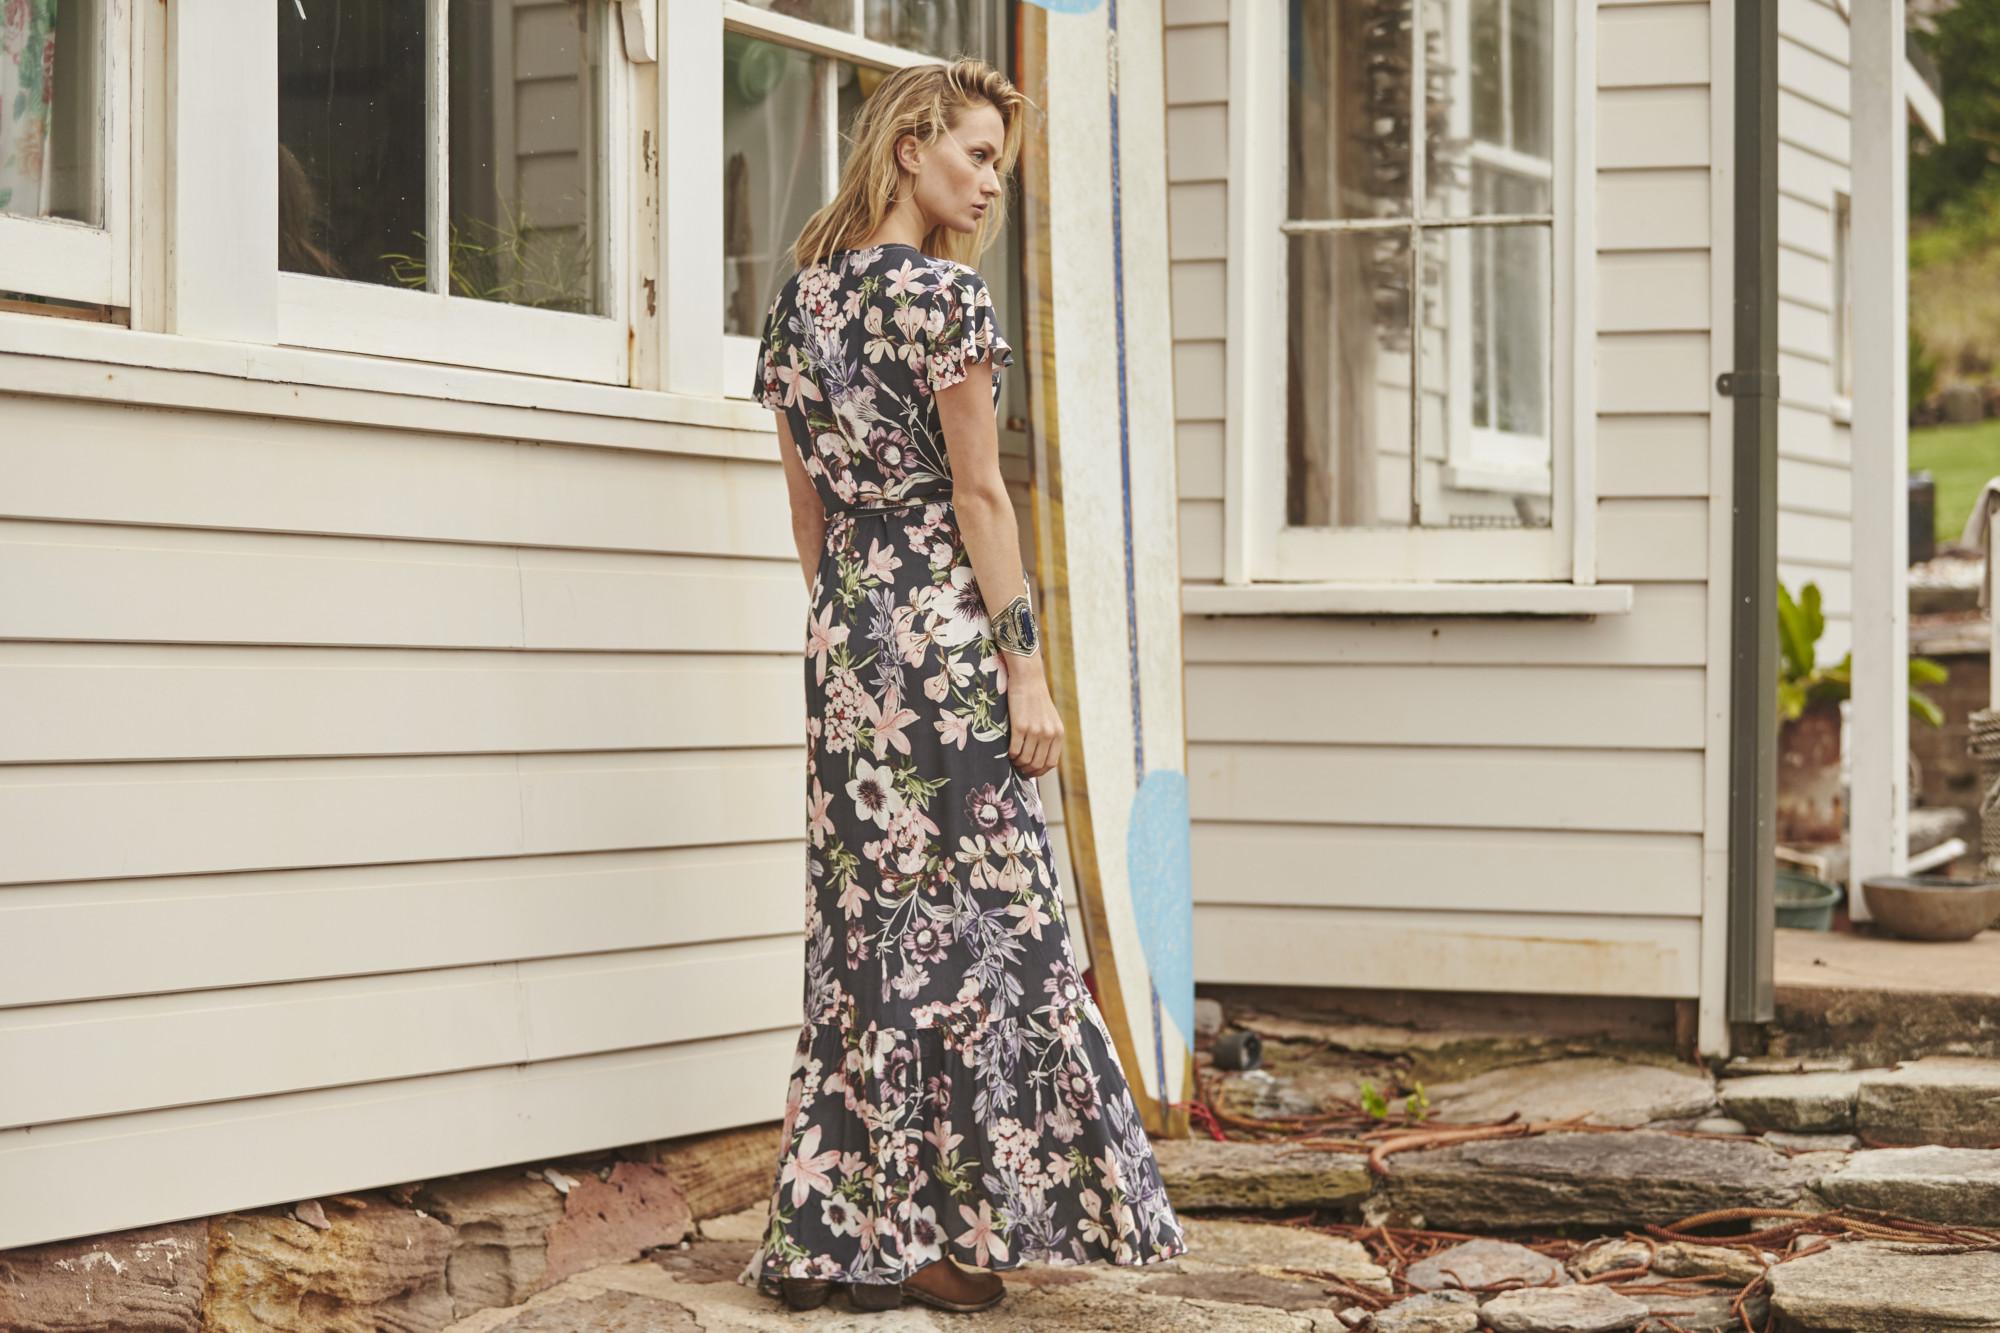 Augustina-Wrap-Dress-AUG-GDW2-16423-MFB-moon-flower-black_6